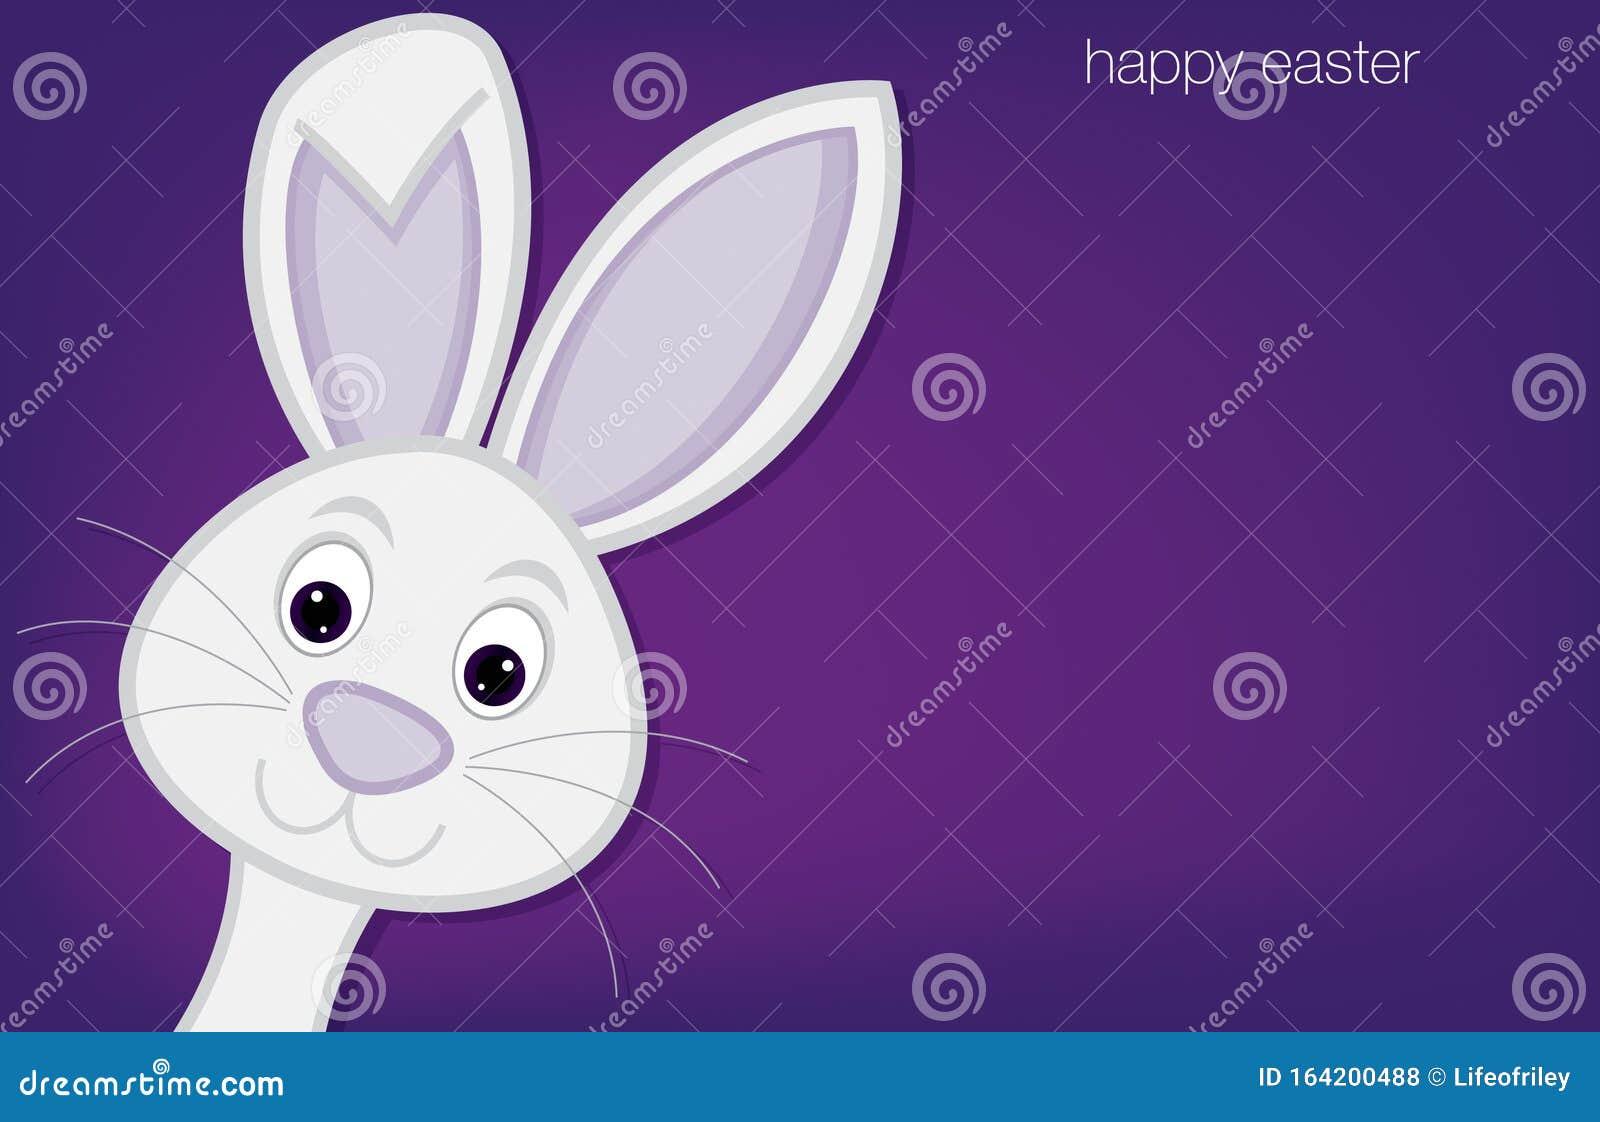 Cute Hiding Easter Bunny Card Stock Vector Illustration Of Happy Colour 164200488